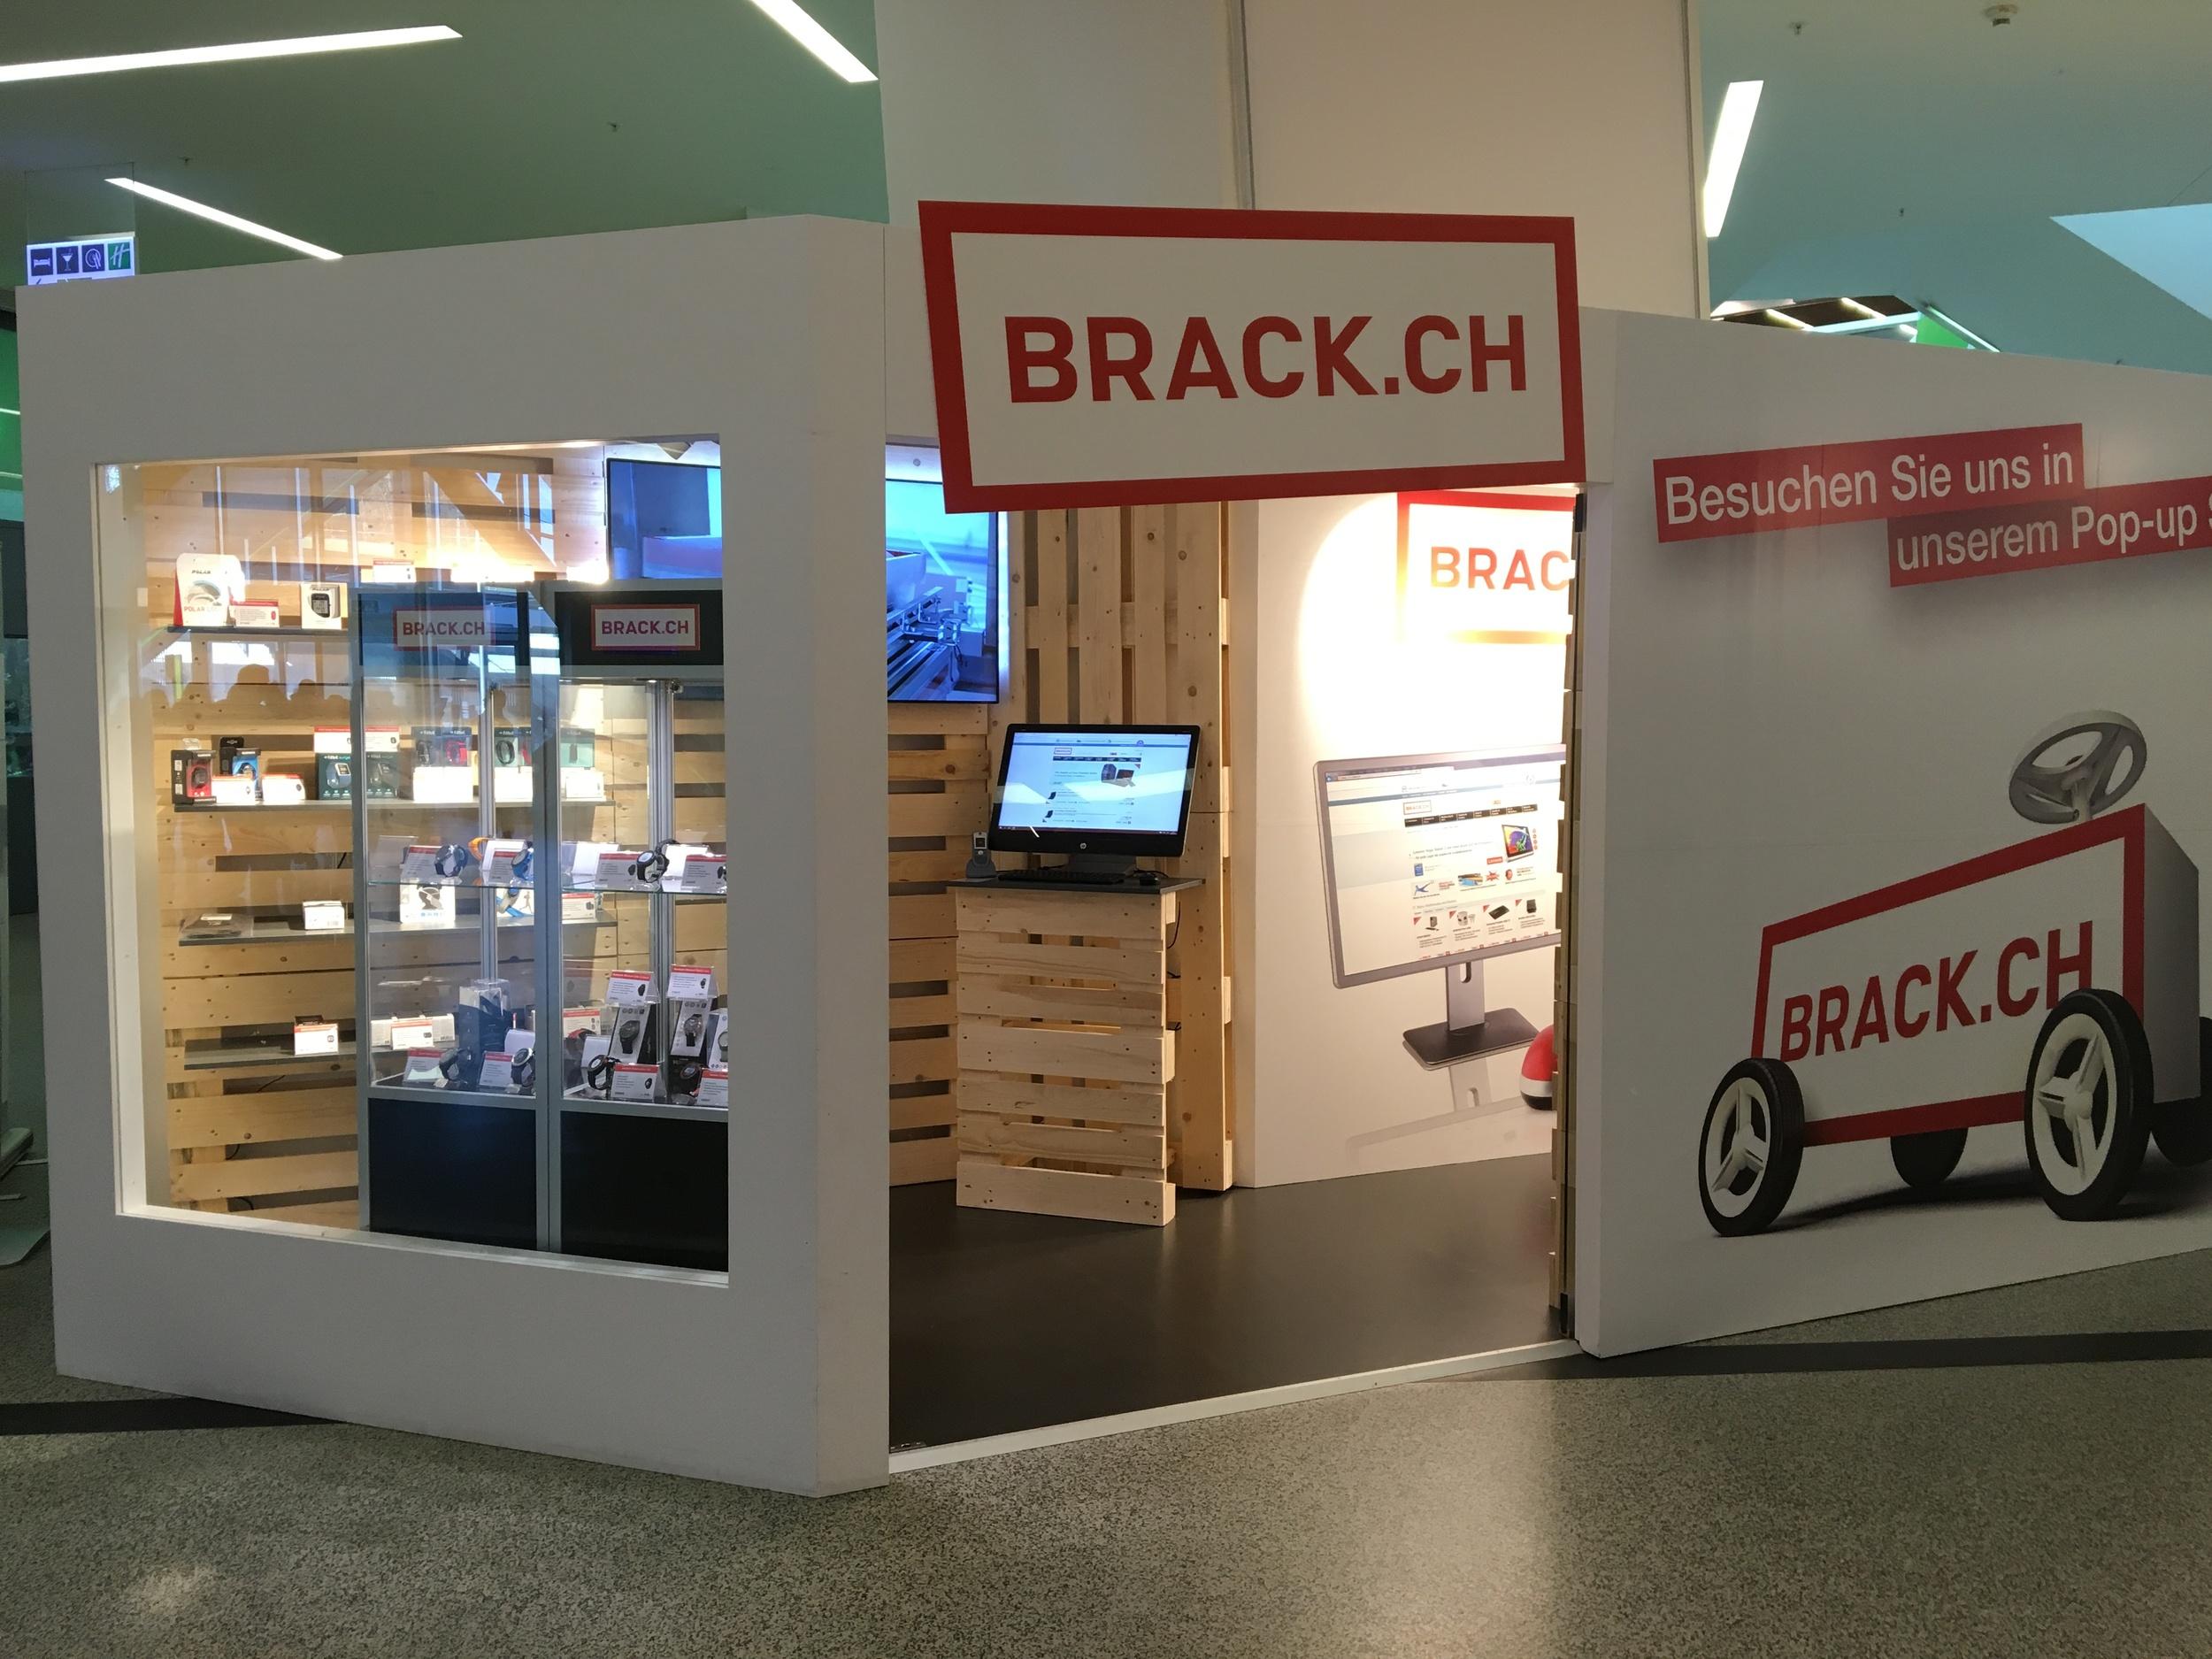 Brack Pop Up Westside Baustellenbericht (51).JPG